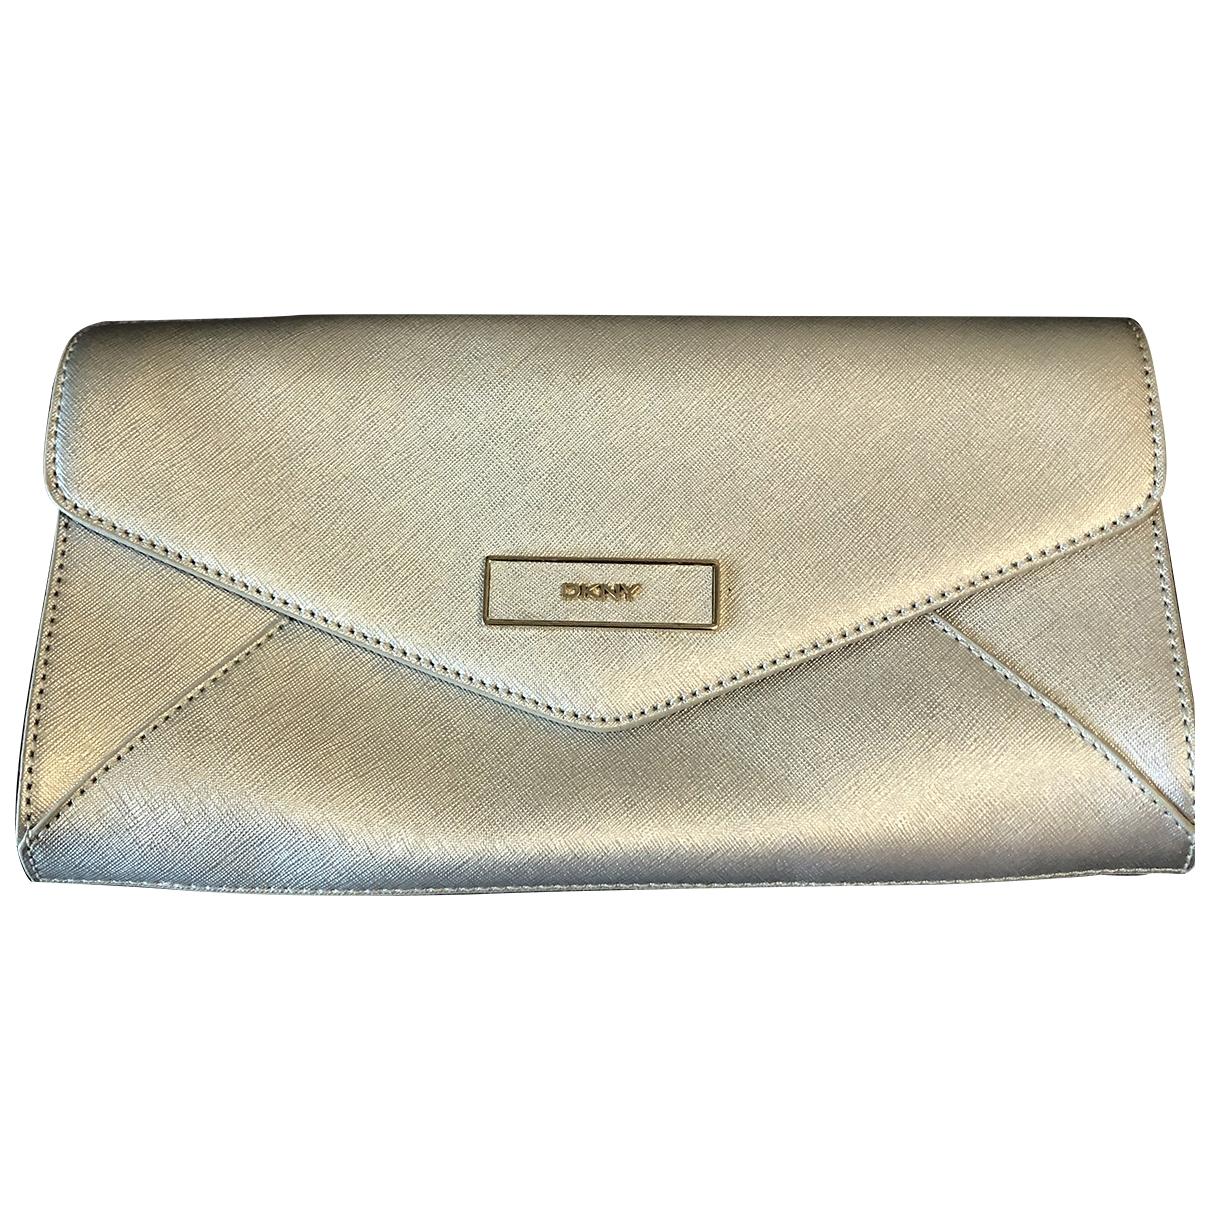 Dkny \N Silver Leather Clutch bag for Women \N